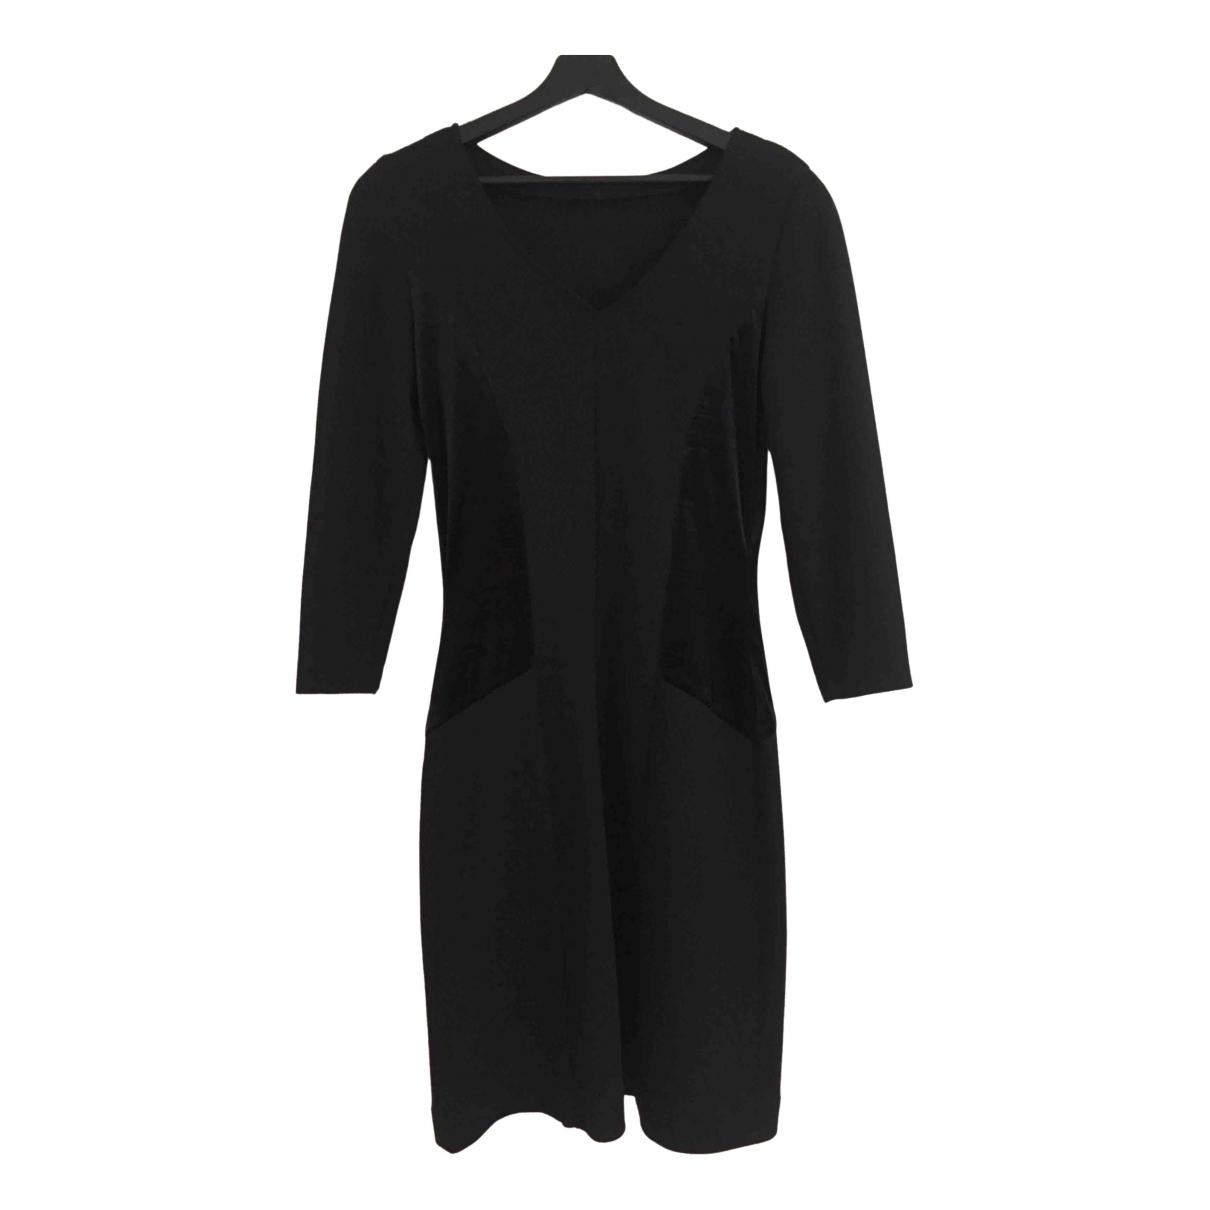 Chiara Boni \N Kleid in  Schwarz Wolle